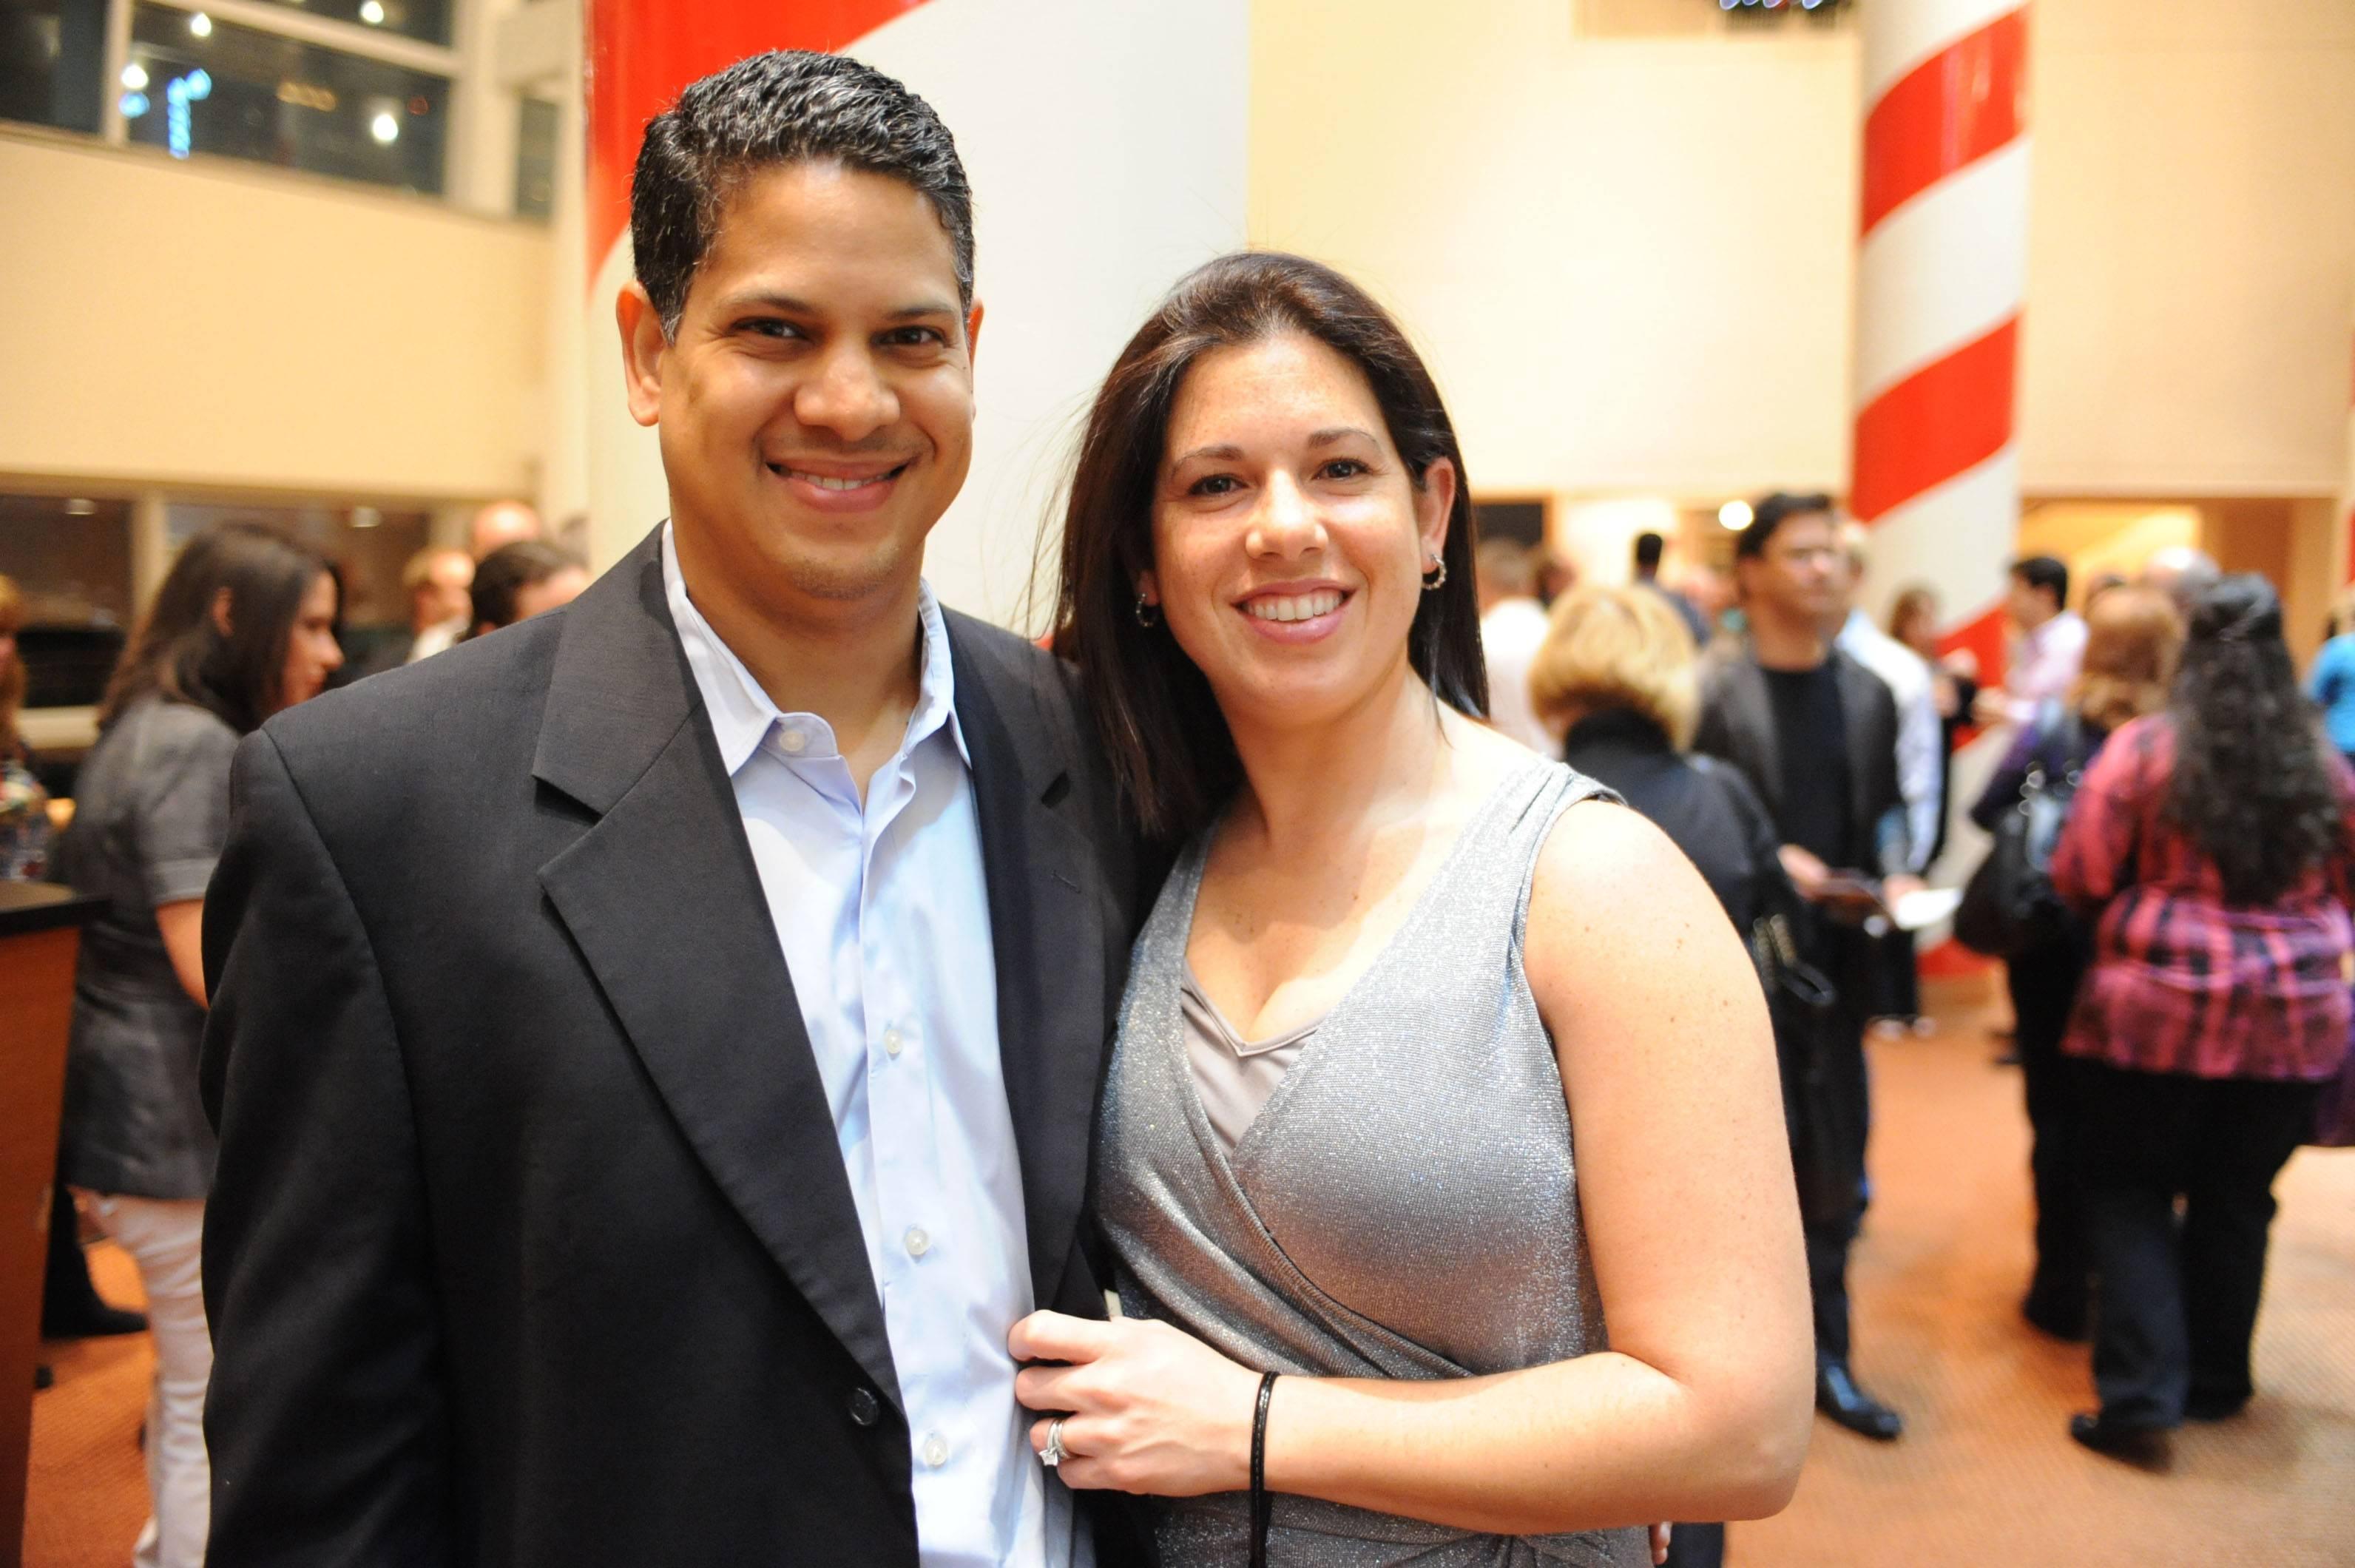 Darren and Melissa Ferreira